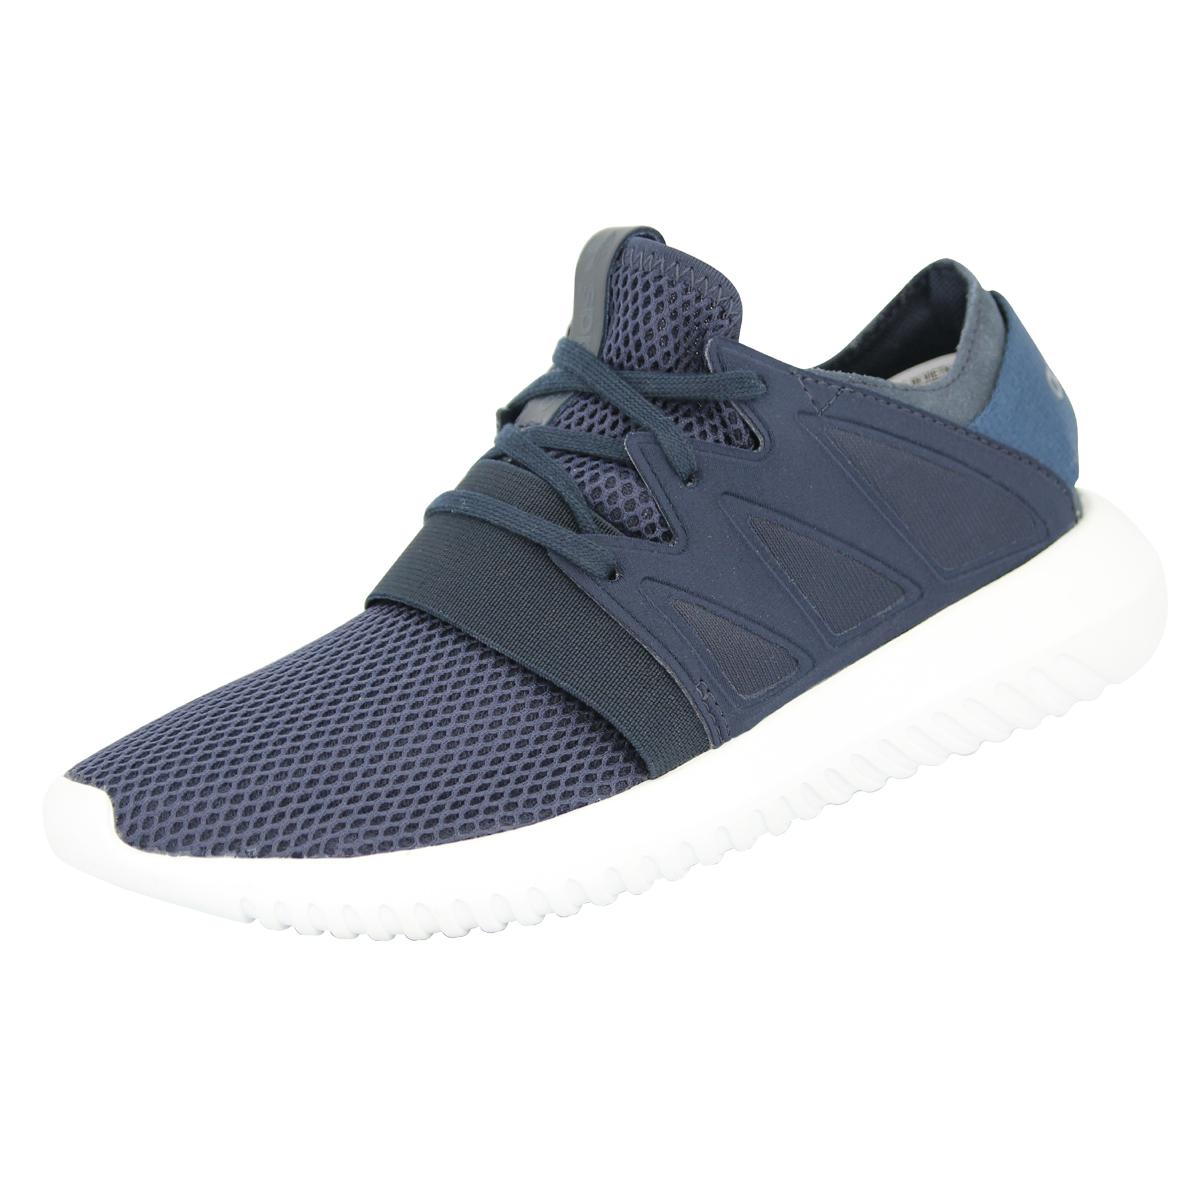 Adidas Originals TUBULAR VIRAL shoes Fashion Sneakers Unisex bluee